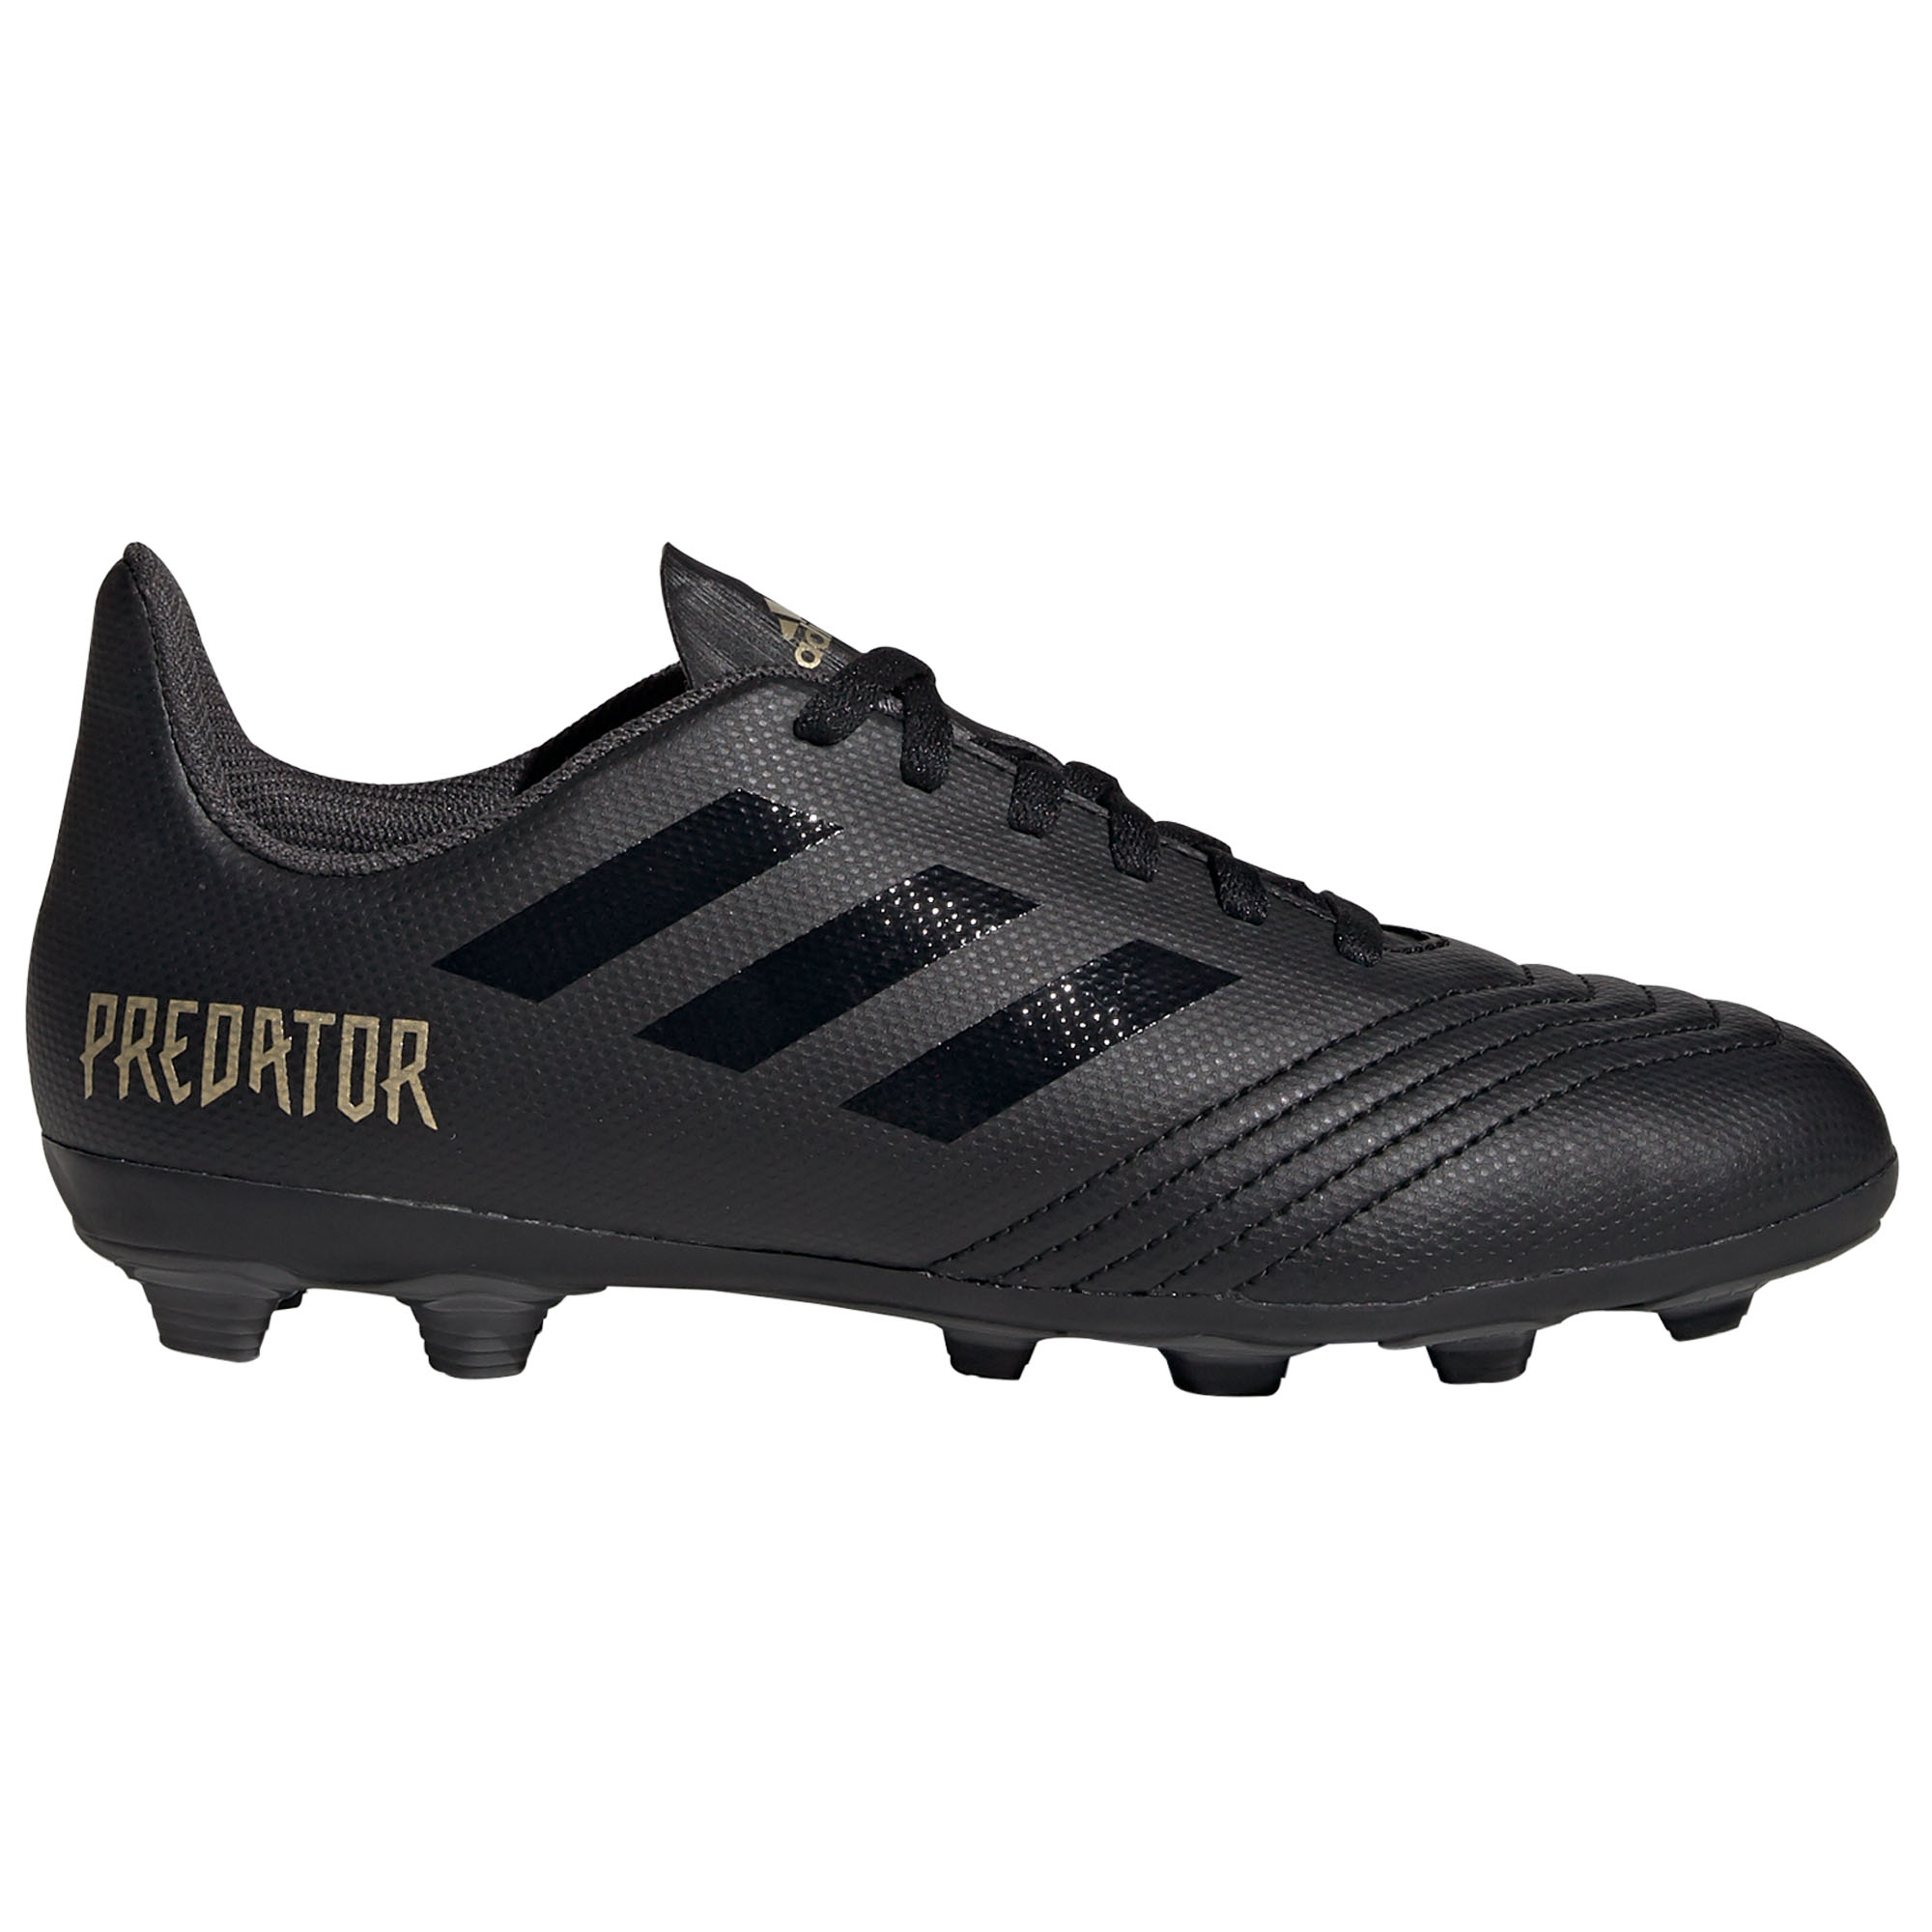 adidas Predator 19.4 FG Firm Ground Kids Football Soccer